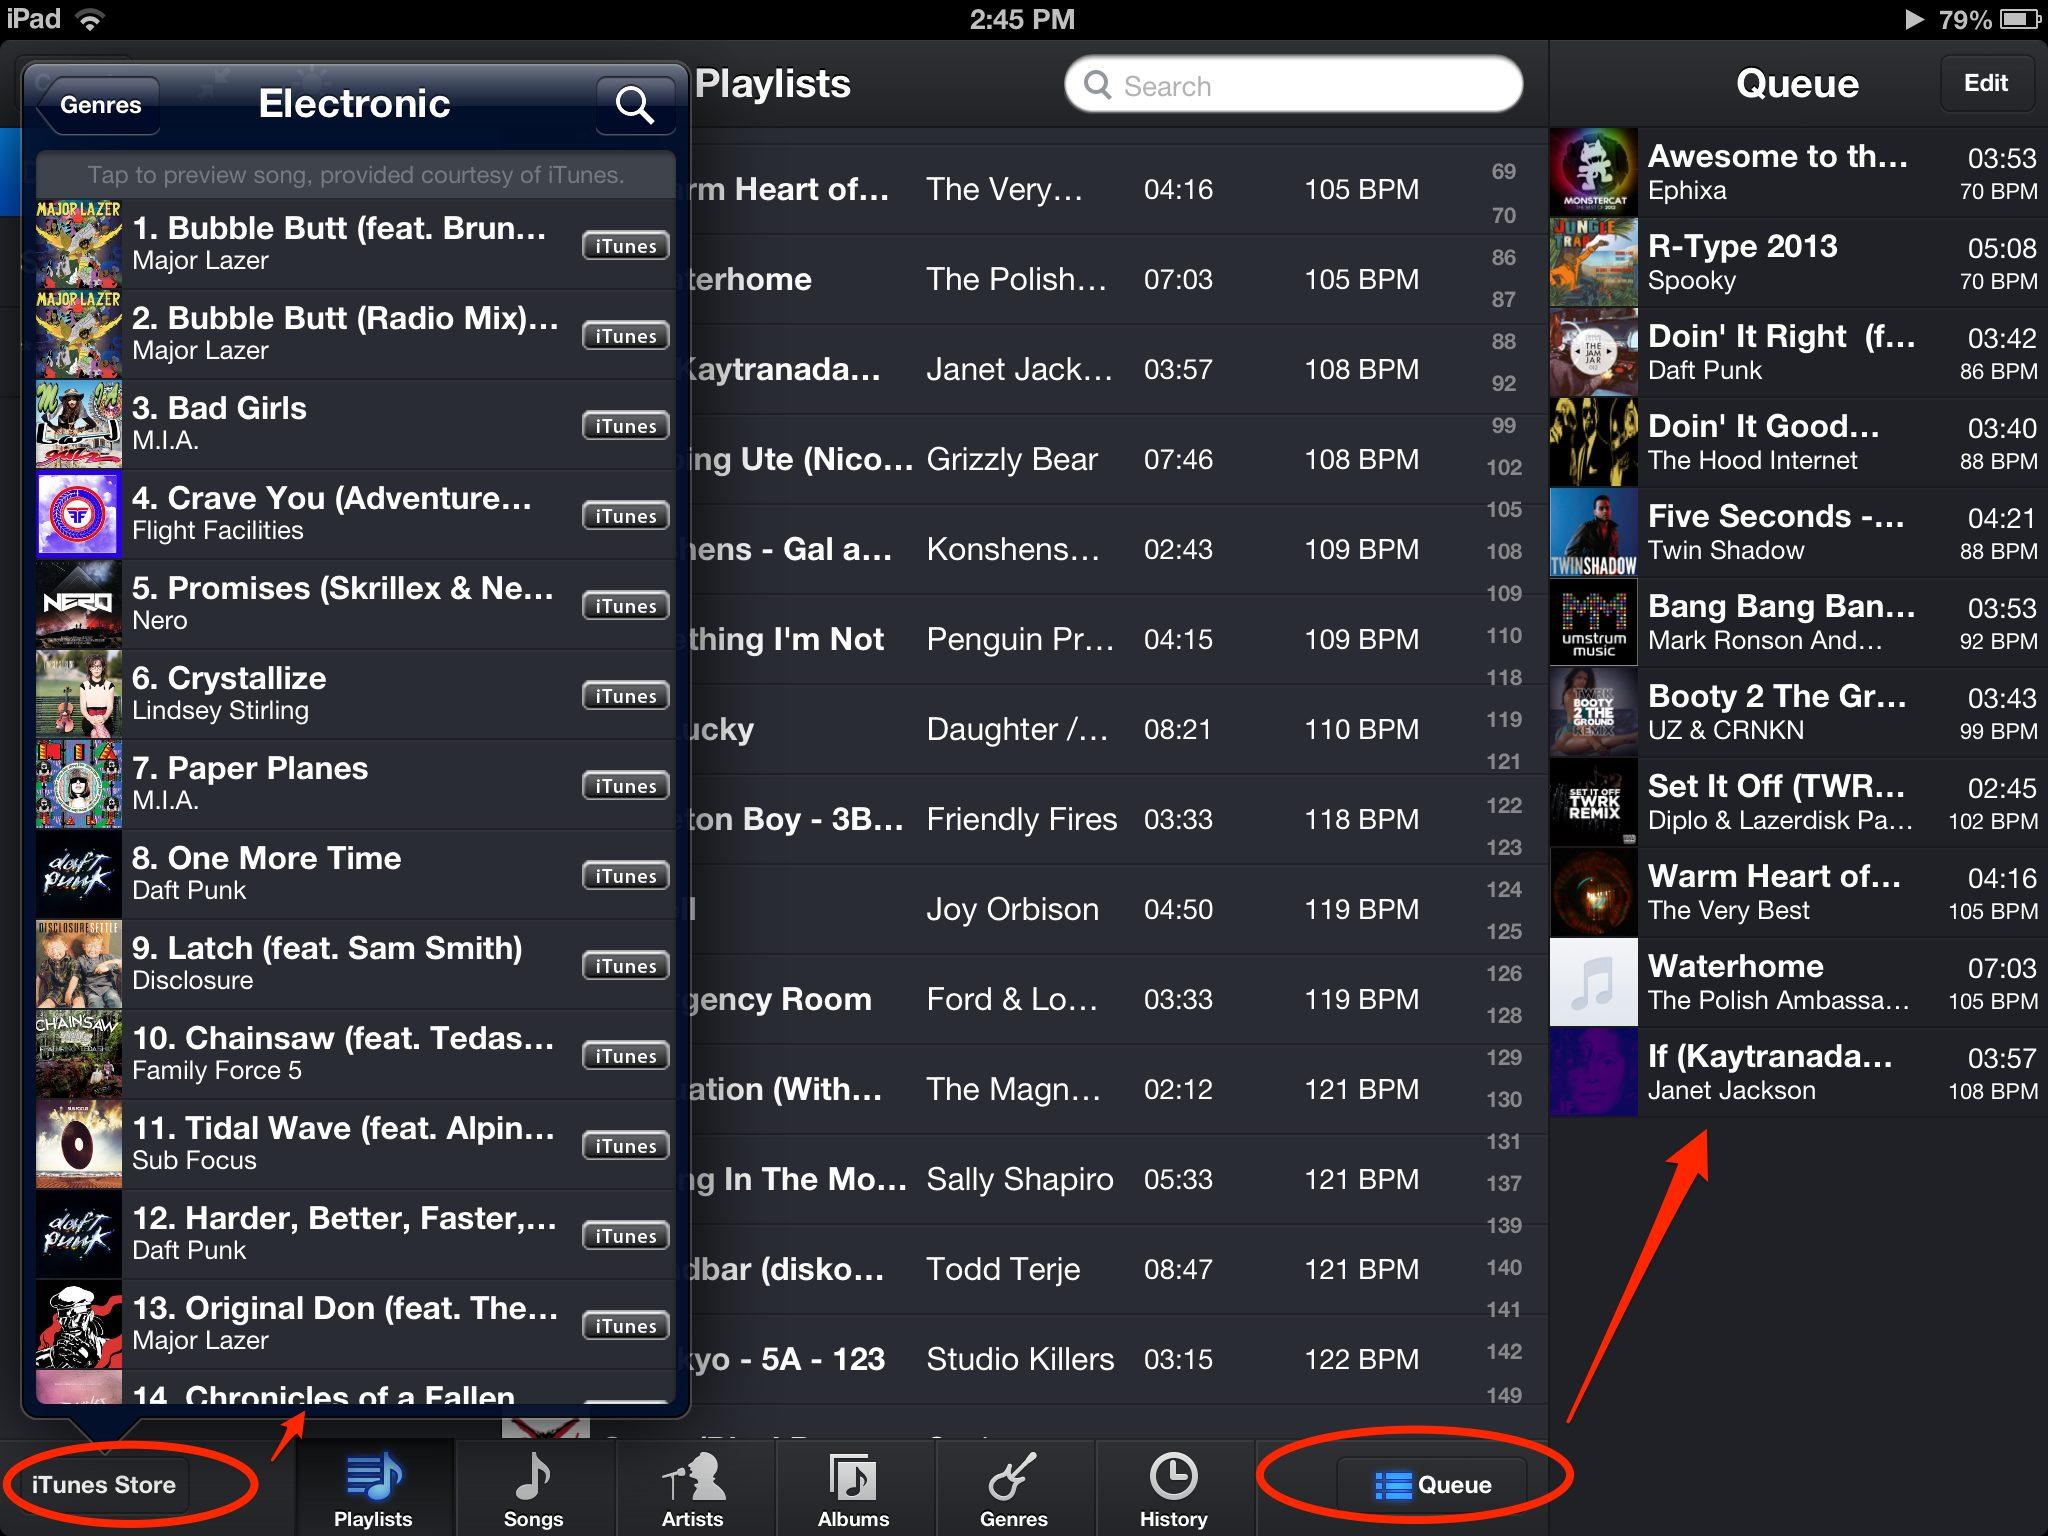 Review: Algoriddim djay 2 App for iPad & iPhone - DJ TechTools